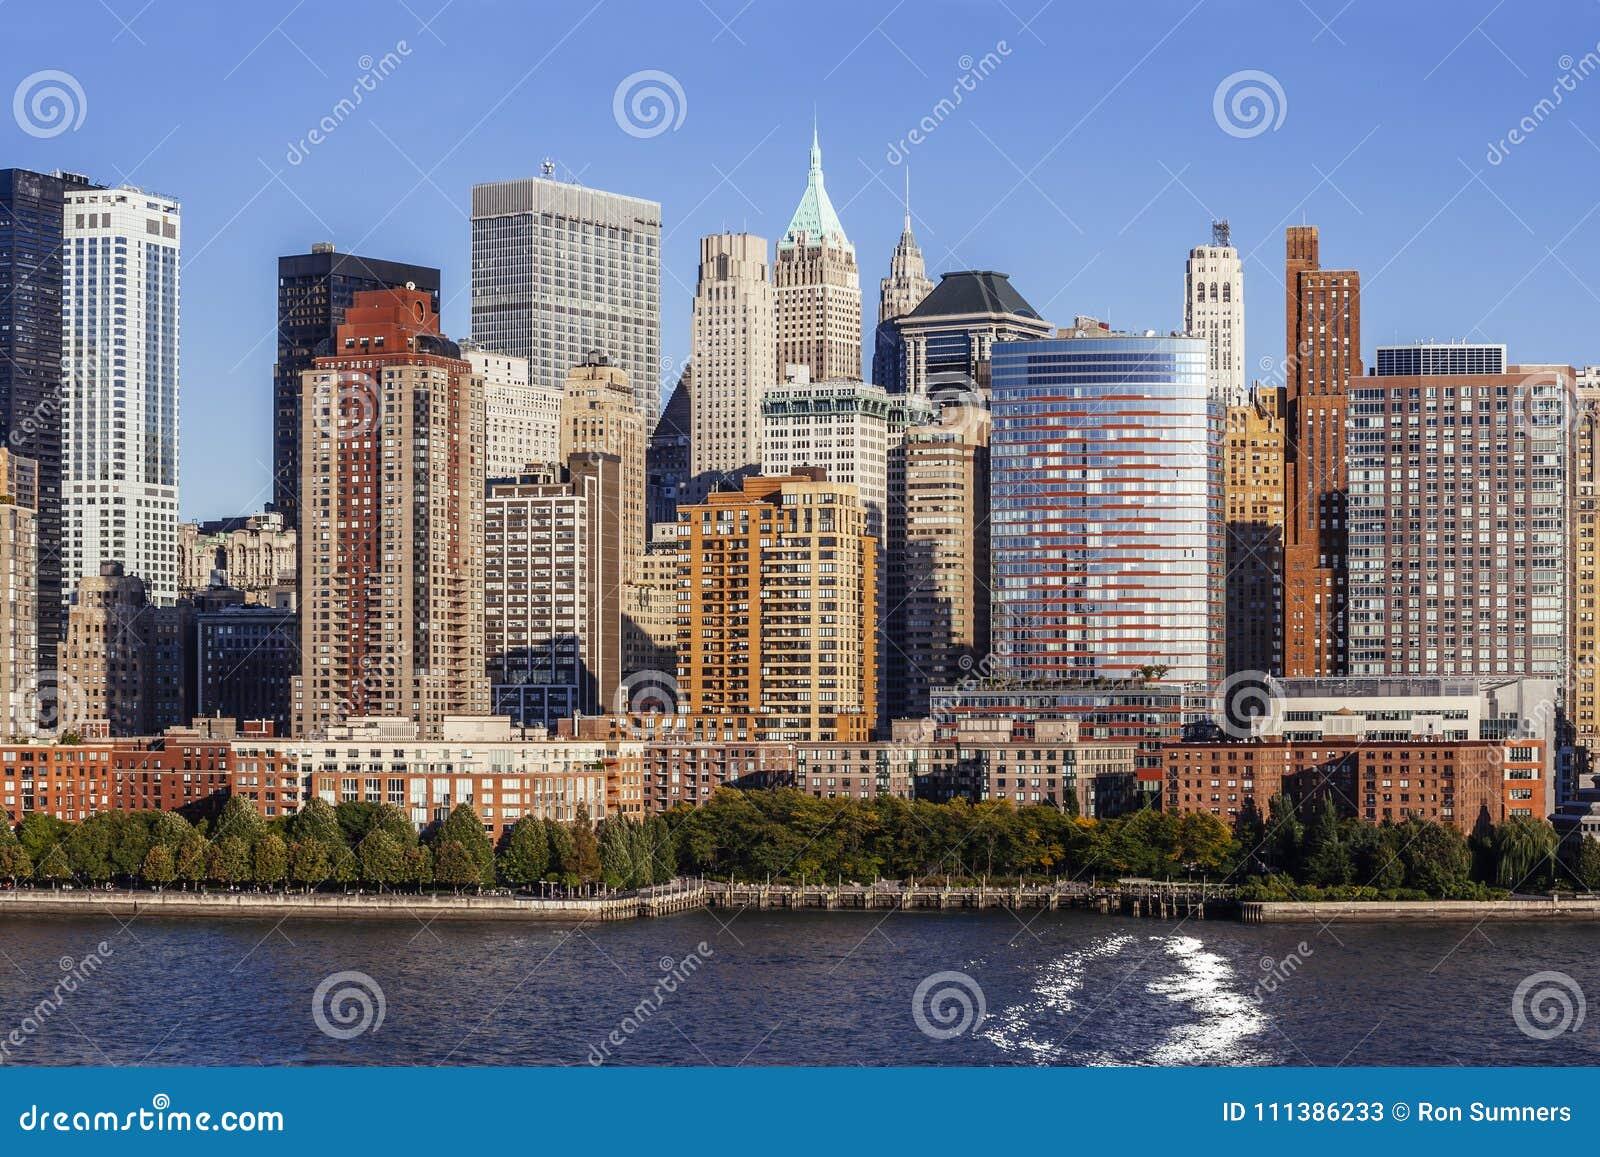 Midtown Manhattan from Hudson River